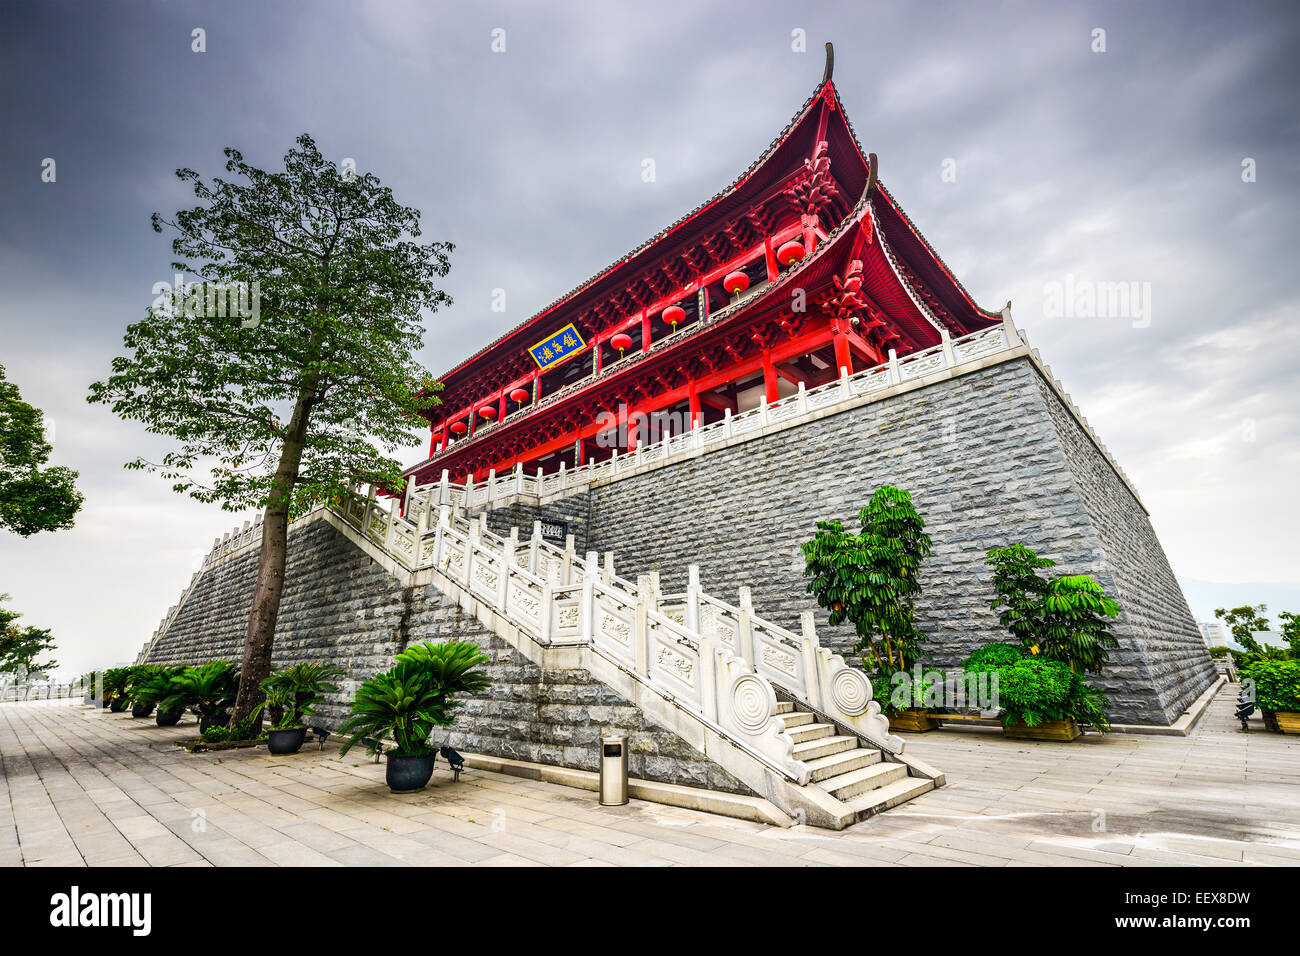 Fuzhou, China at the historic Zhenhai Tower. - Stock Image